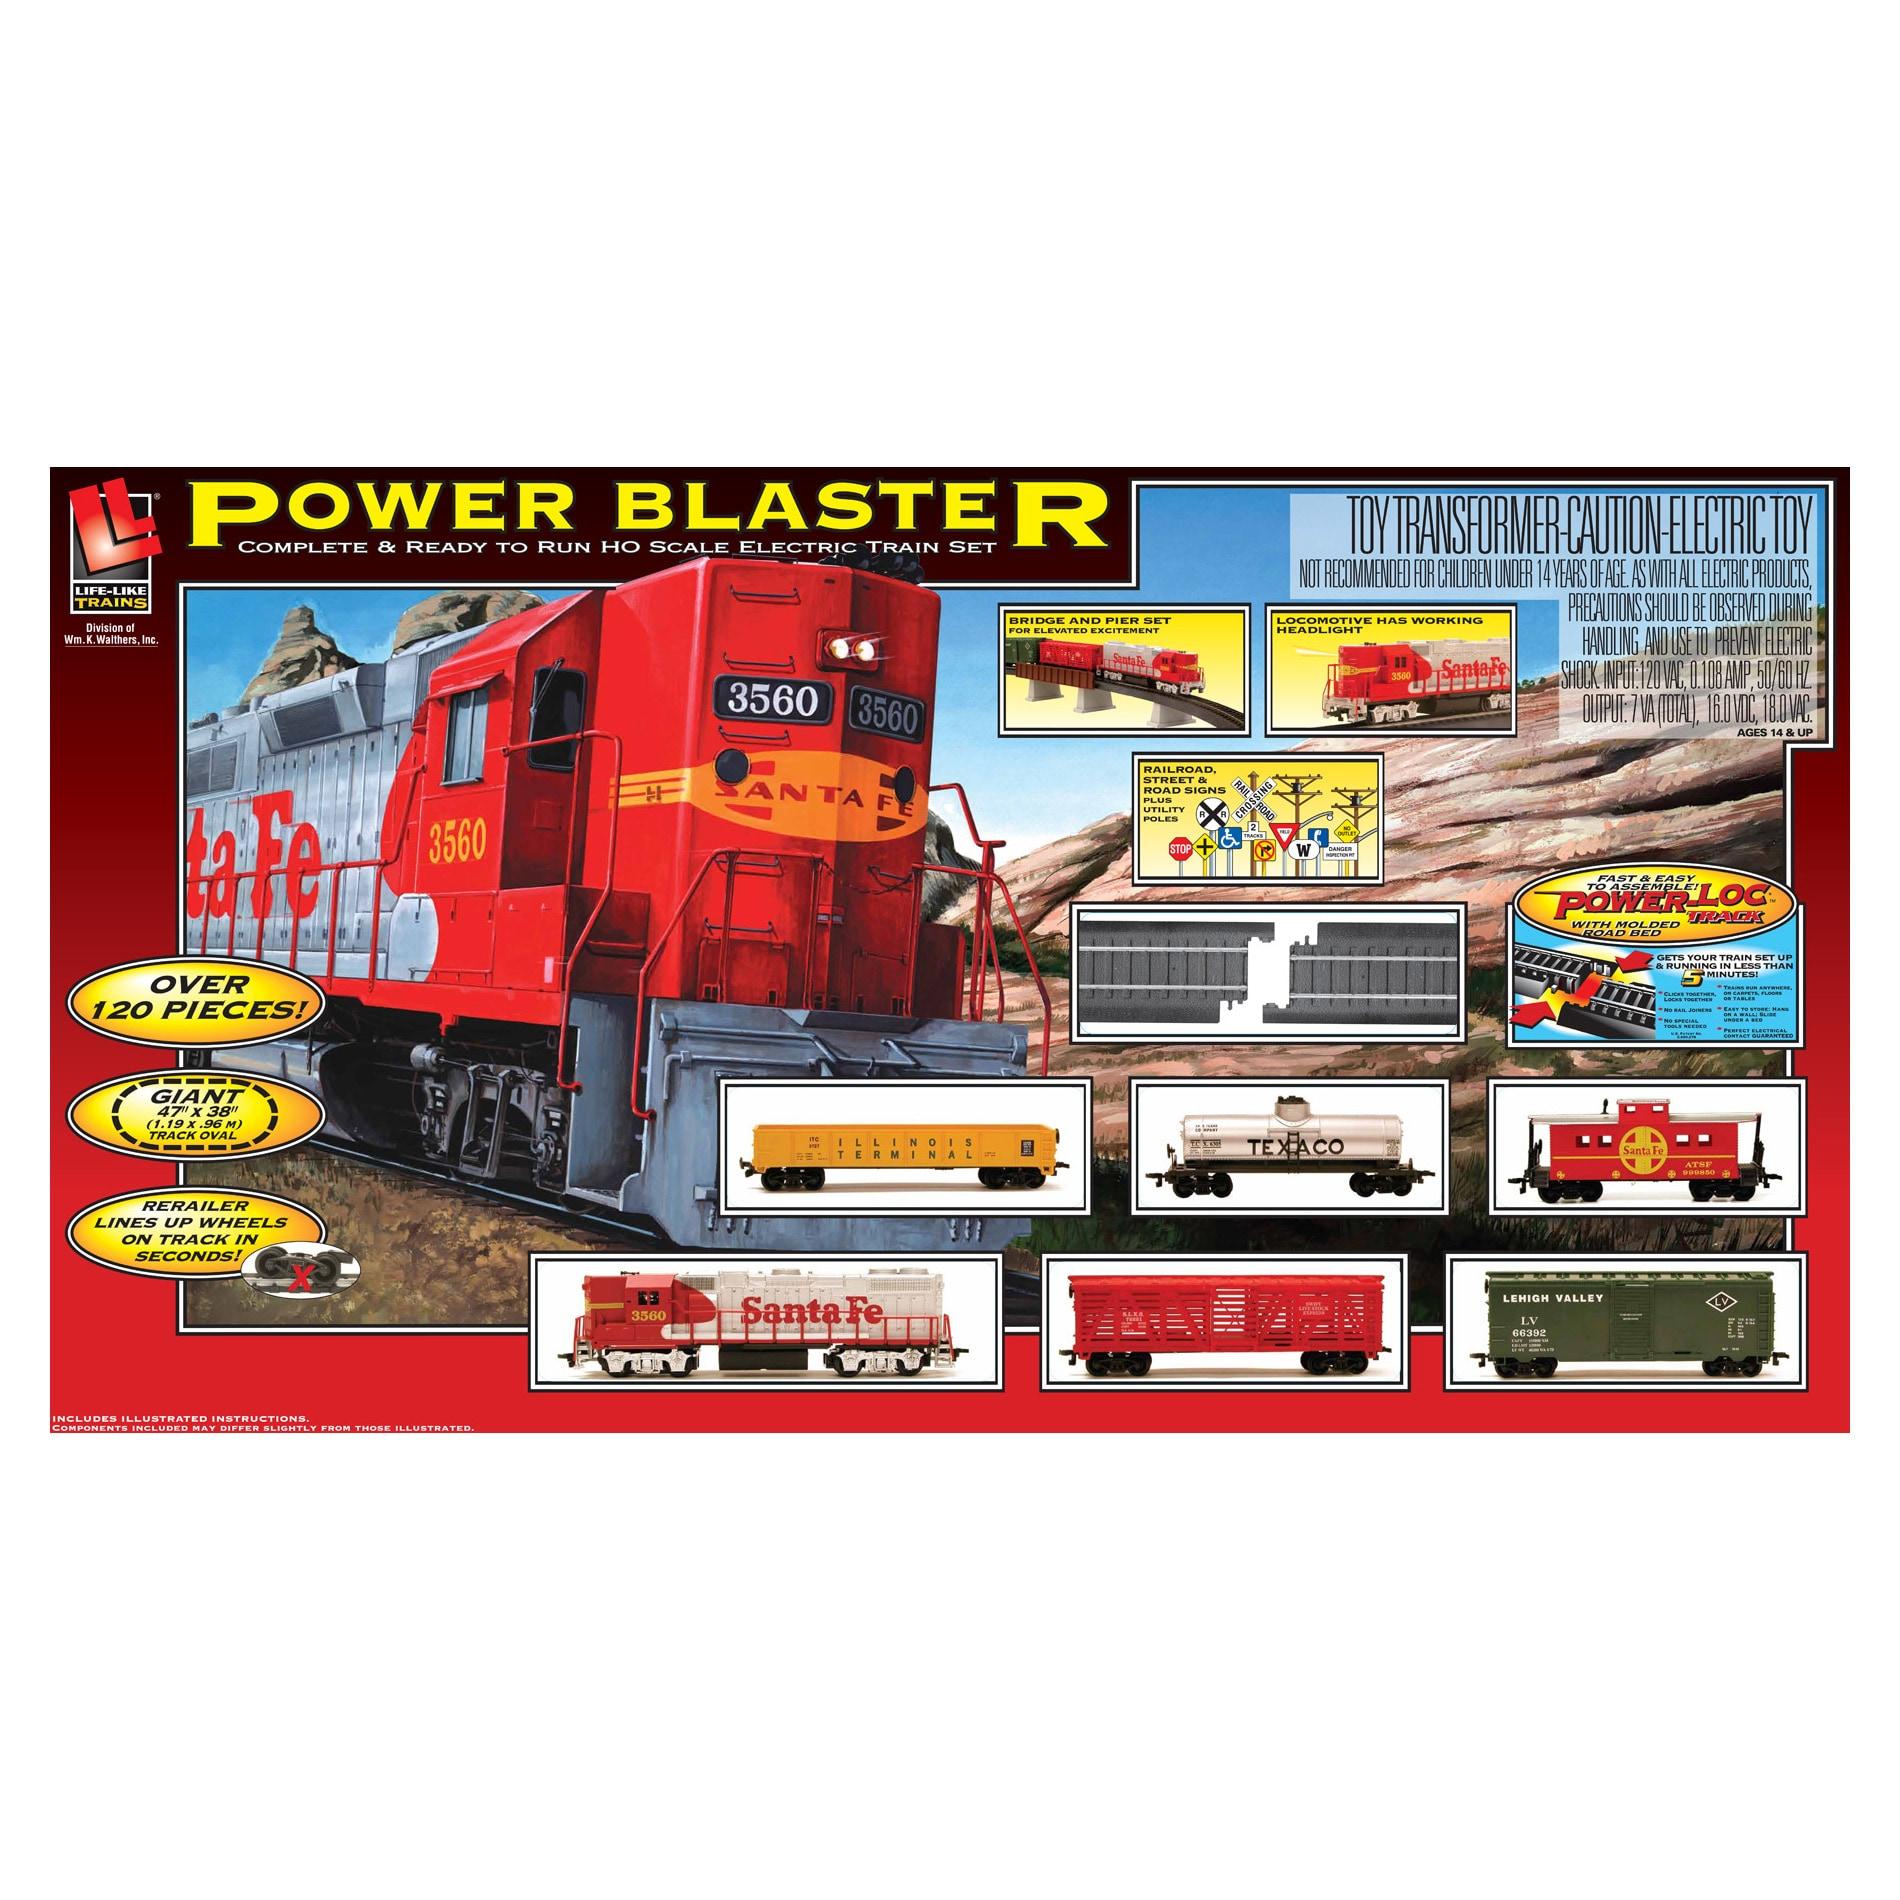 Power Blaster Electric Train Set